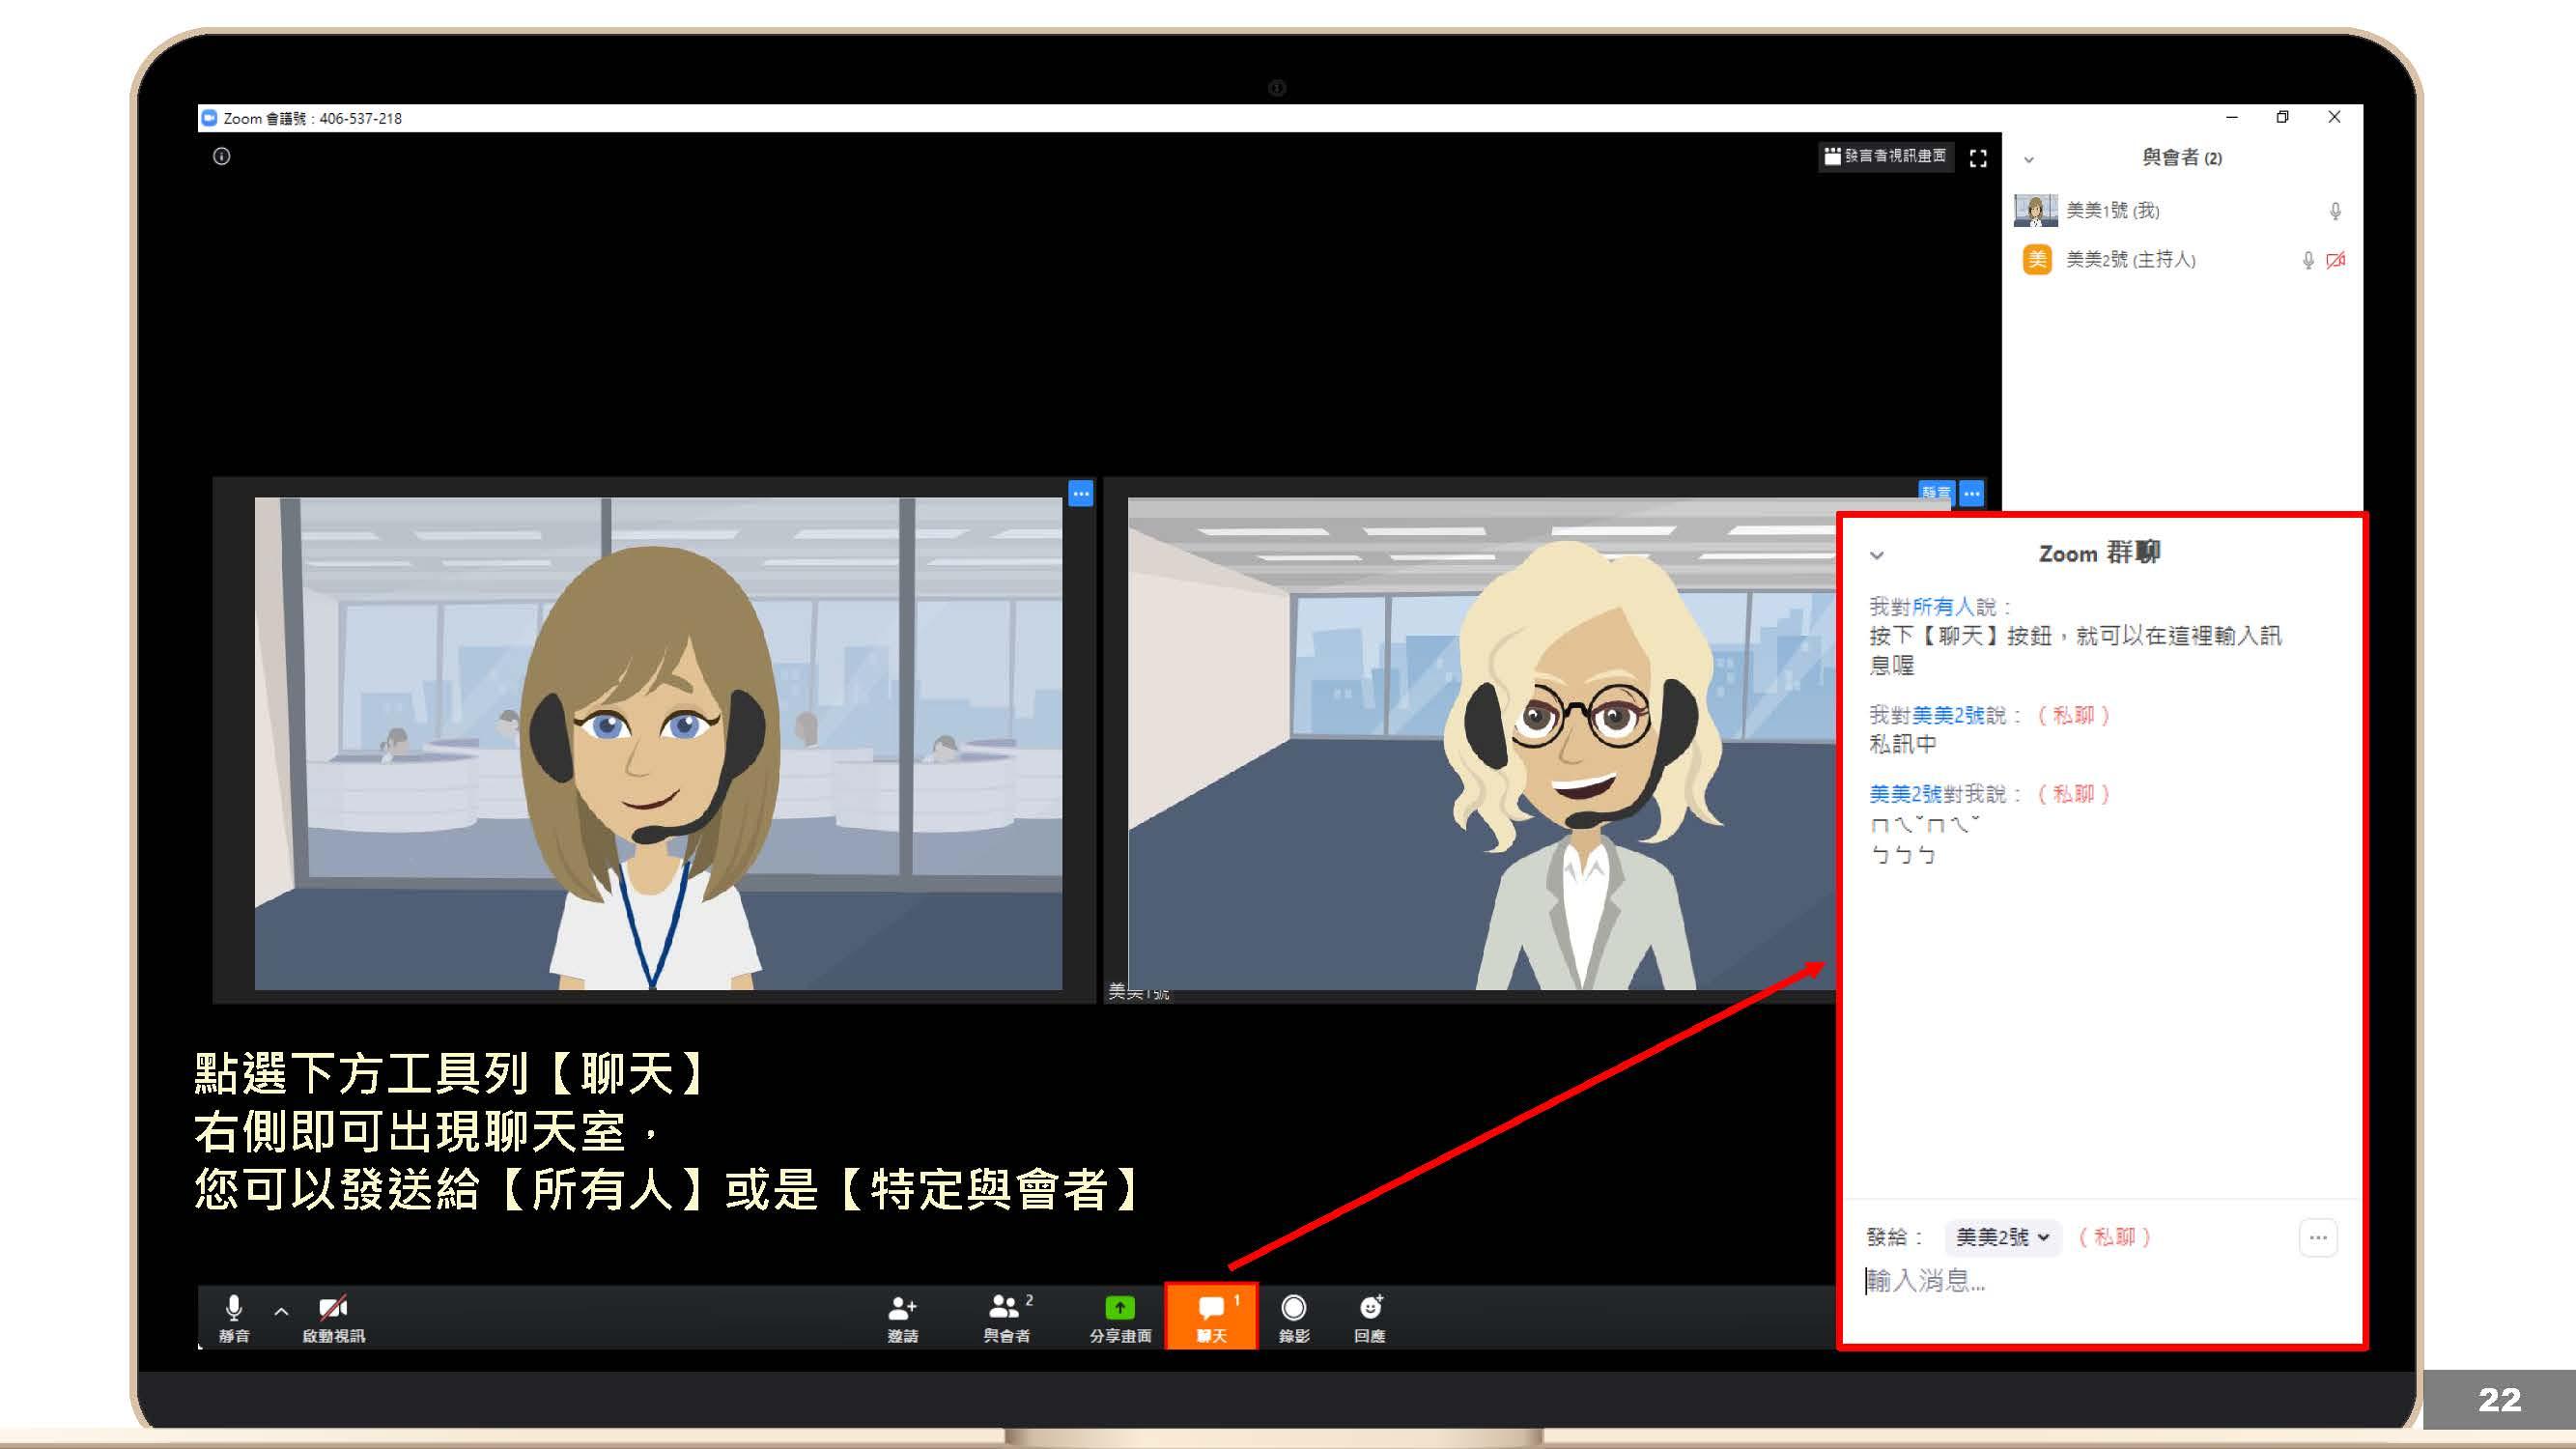 Zoom視訊會議_與會者_操作手冊_頁面_22